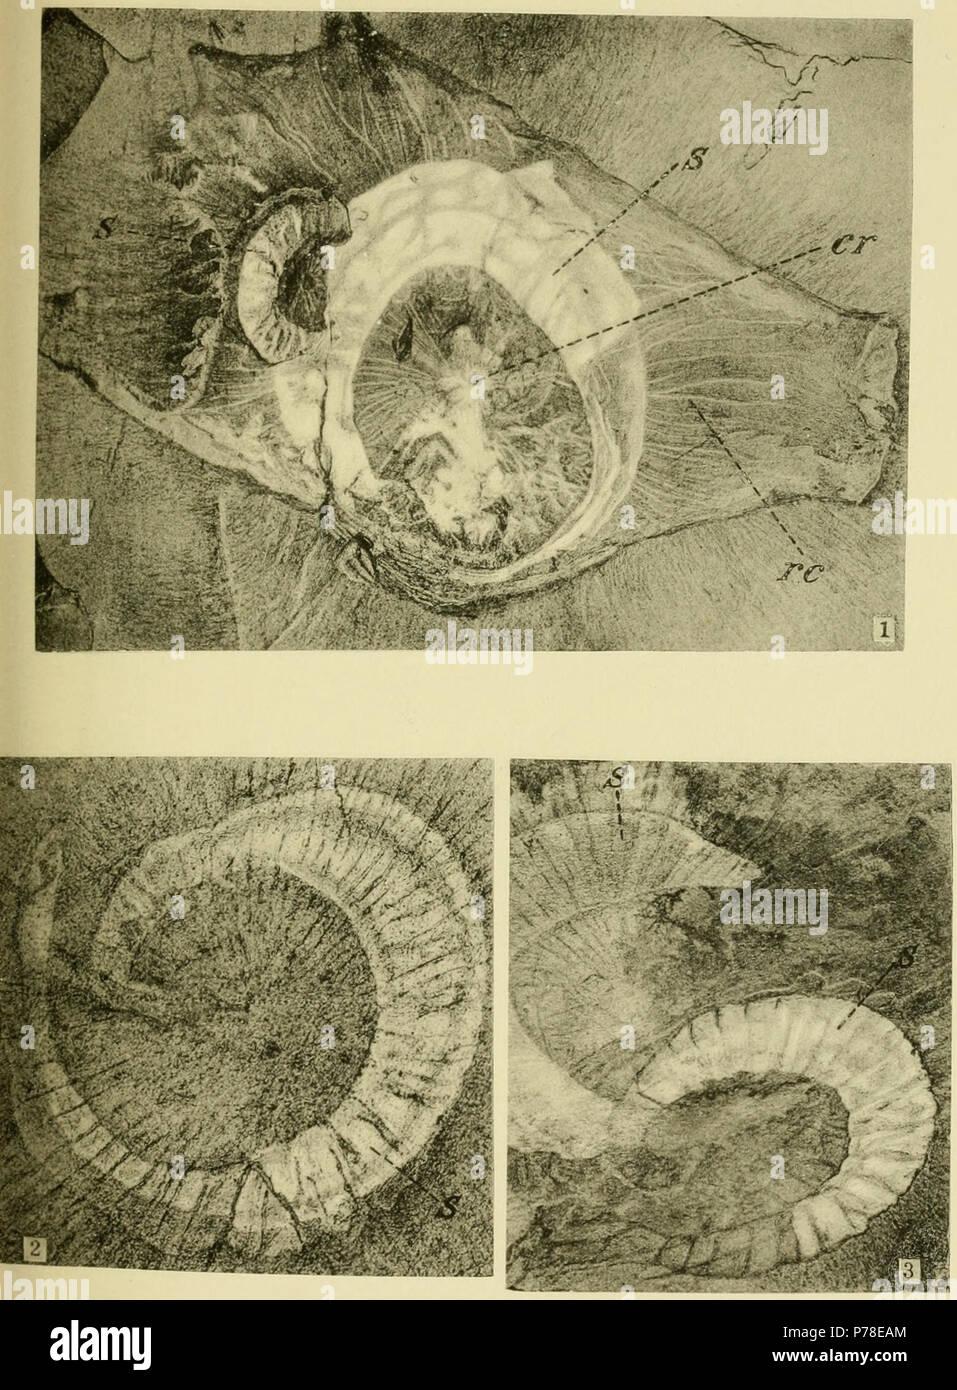 Plate 10: Middle Cambrian Holothurians (Eldonia) 1. Eldonia ludwigi Walcott = 2. Eldonia ludwigi Walcott = 3. Eldonia ludwigi Walcott = . 1911 65 Walcott Cambrian Geology and Paleontology II plate 10 Stock Photo